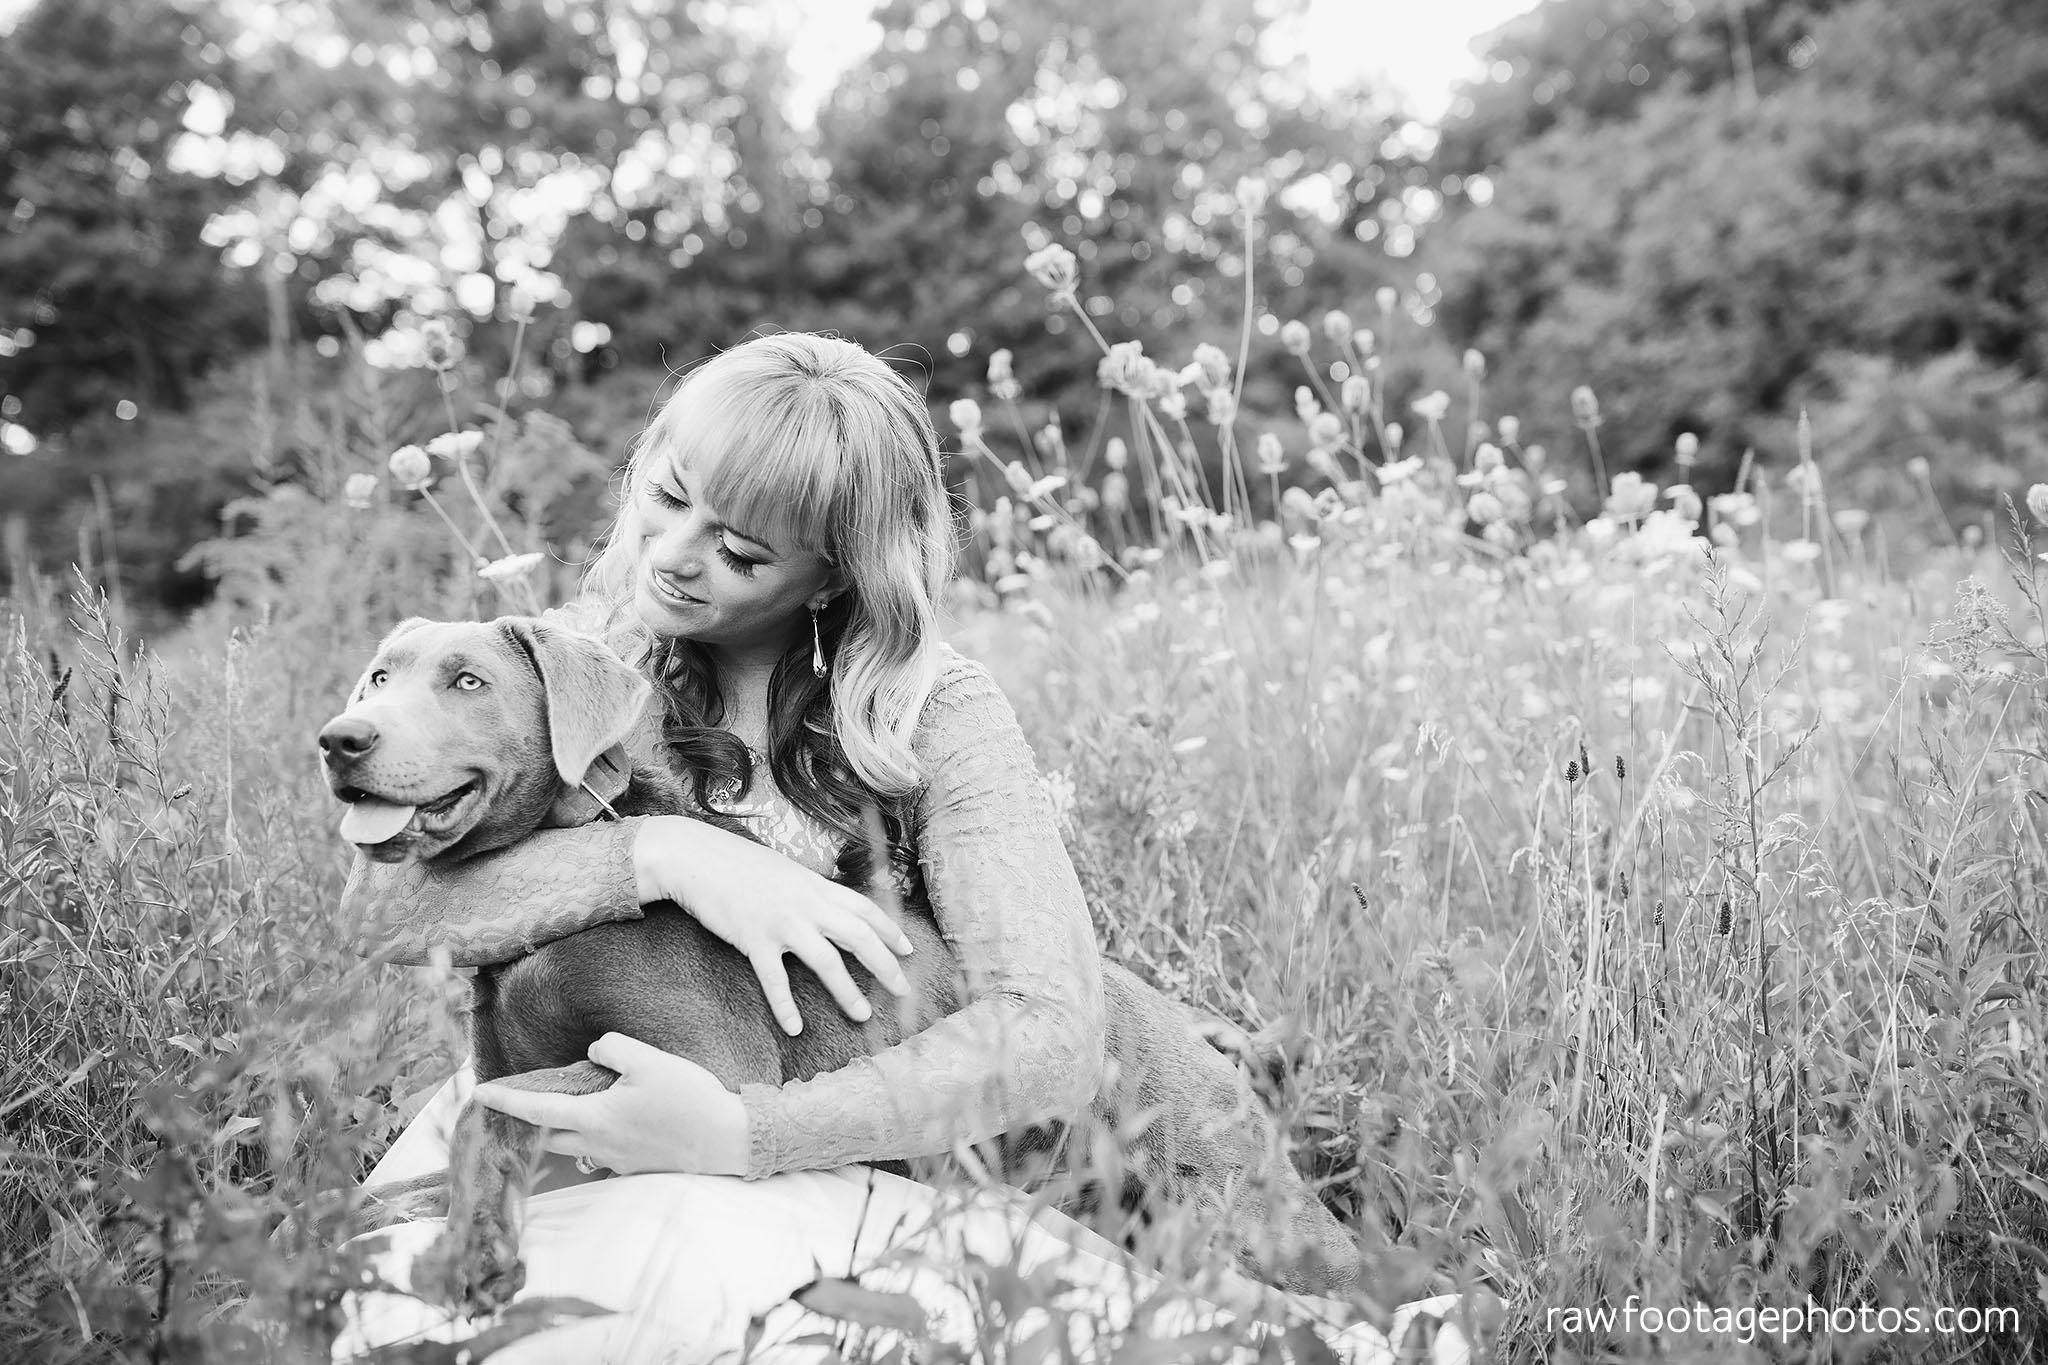 London_Ontario_Photographer-family_photography-pet_photography-lifestyle_photography002.jpg